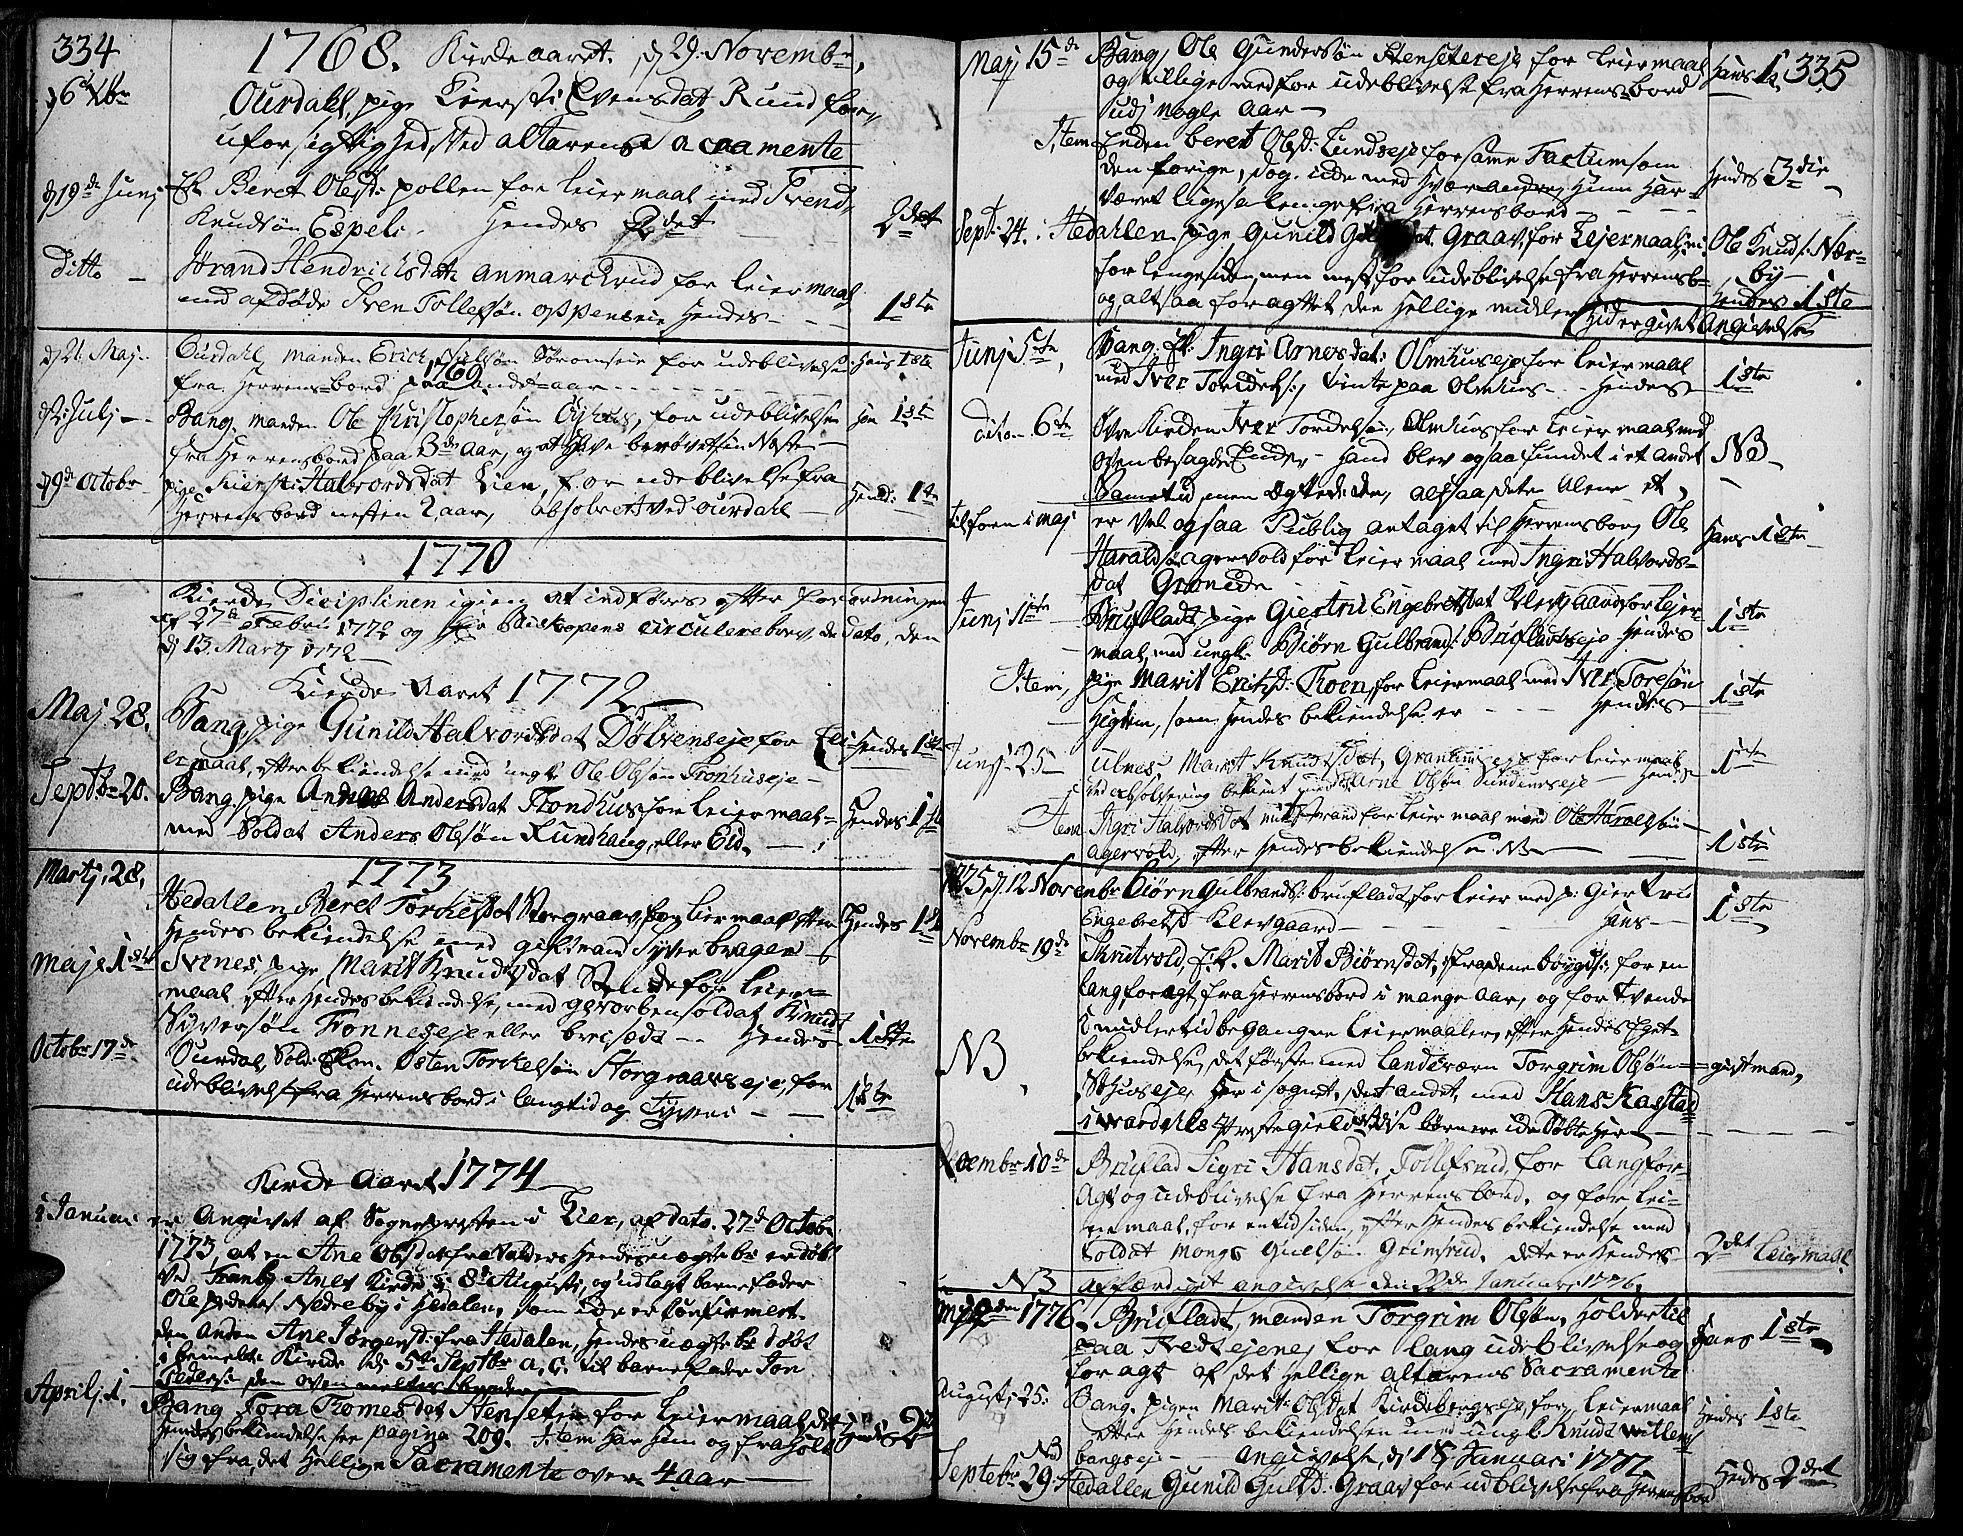 SAH, Aurdal prestekontor, Ministerialbok nr. 5, 1763-1781, s. 334-335